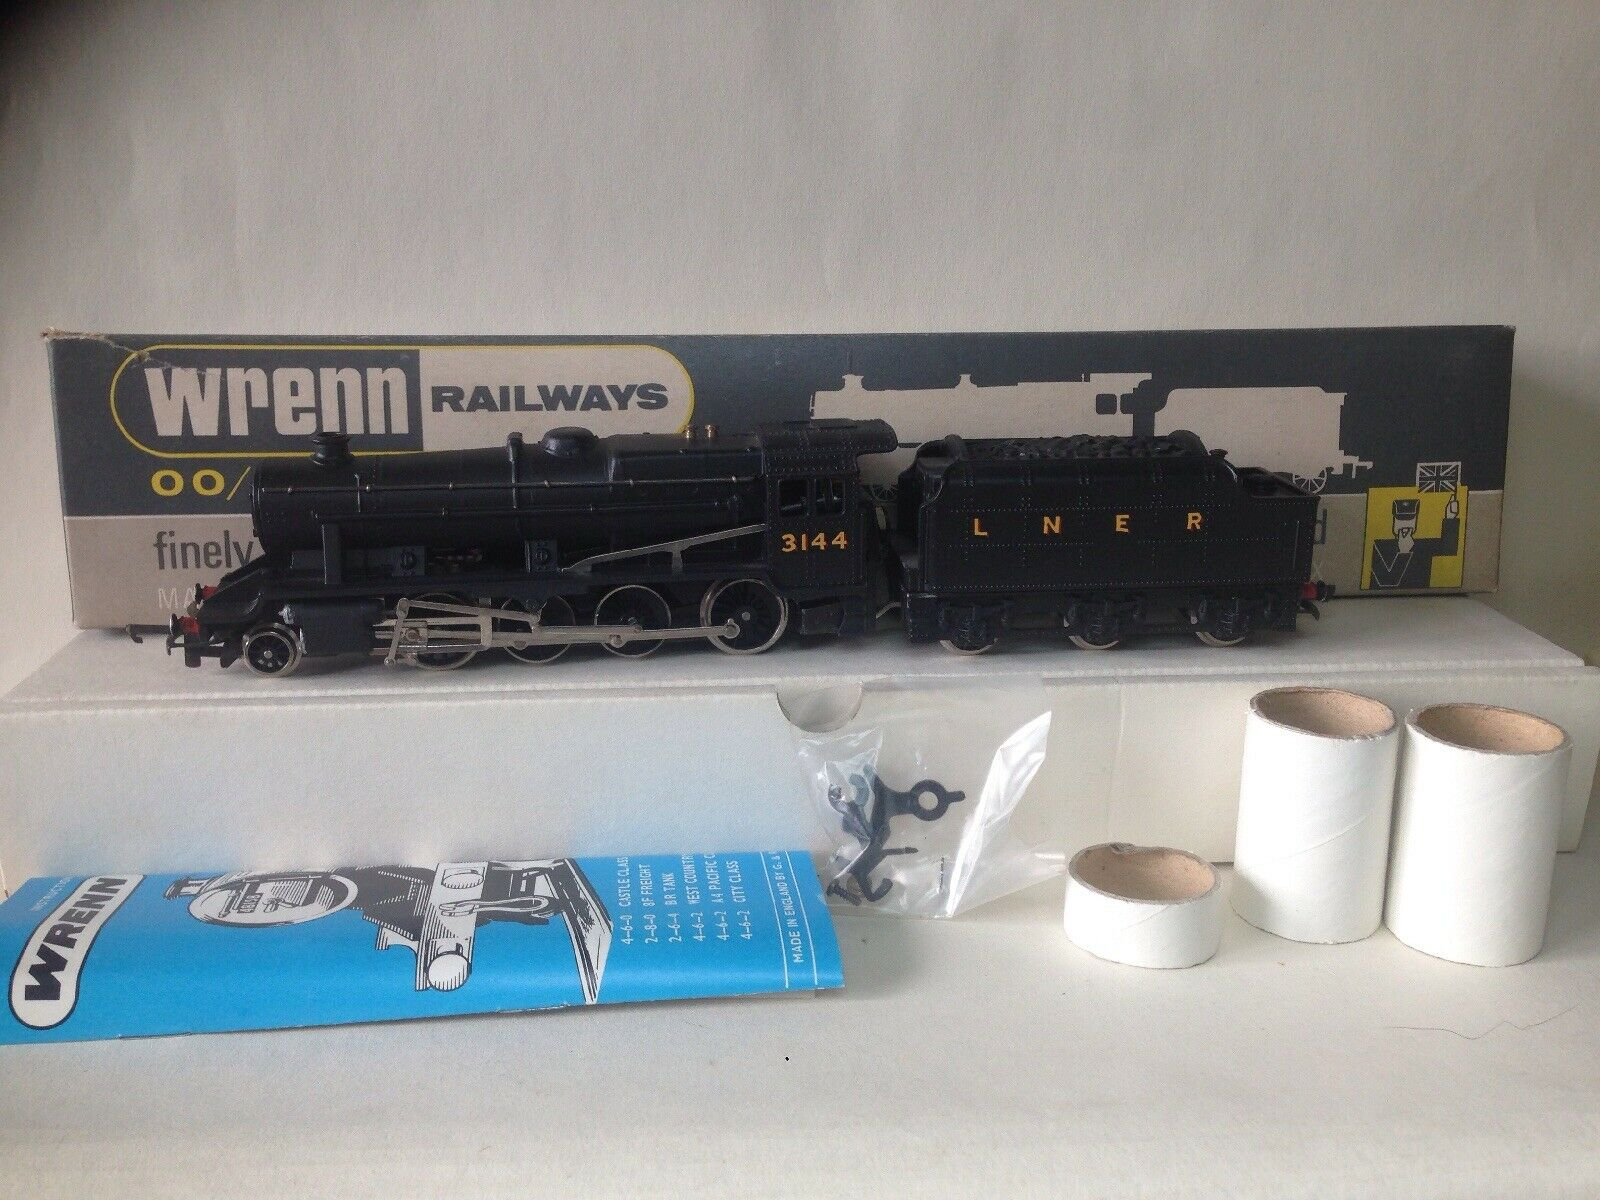 Wrenn 280 classe 8F L.N.E.R Locomotive  3144 OO Gauge Train W2240 scatolaed